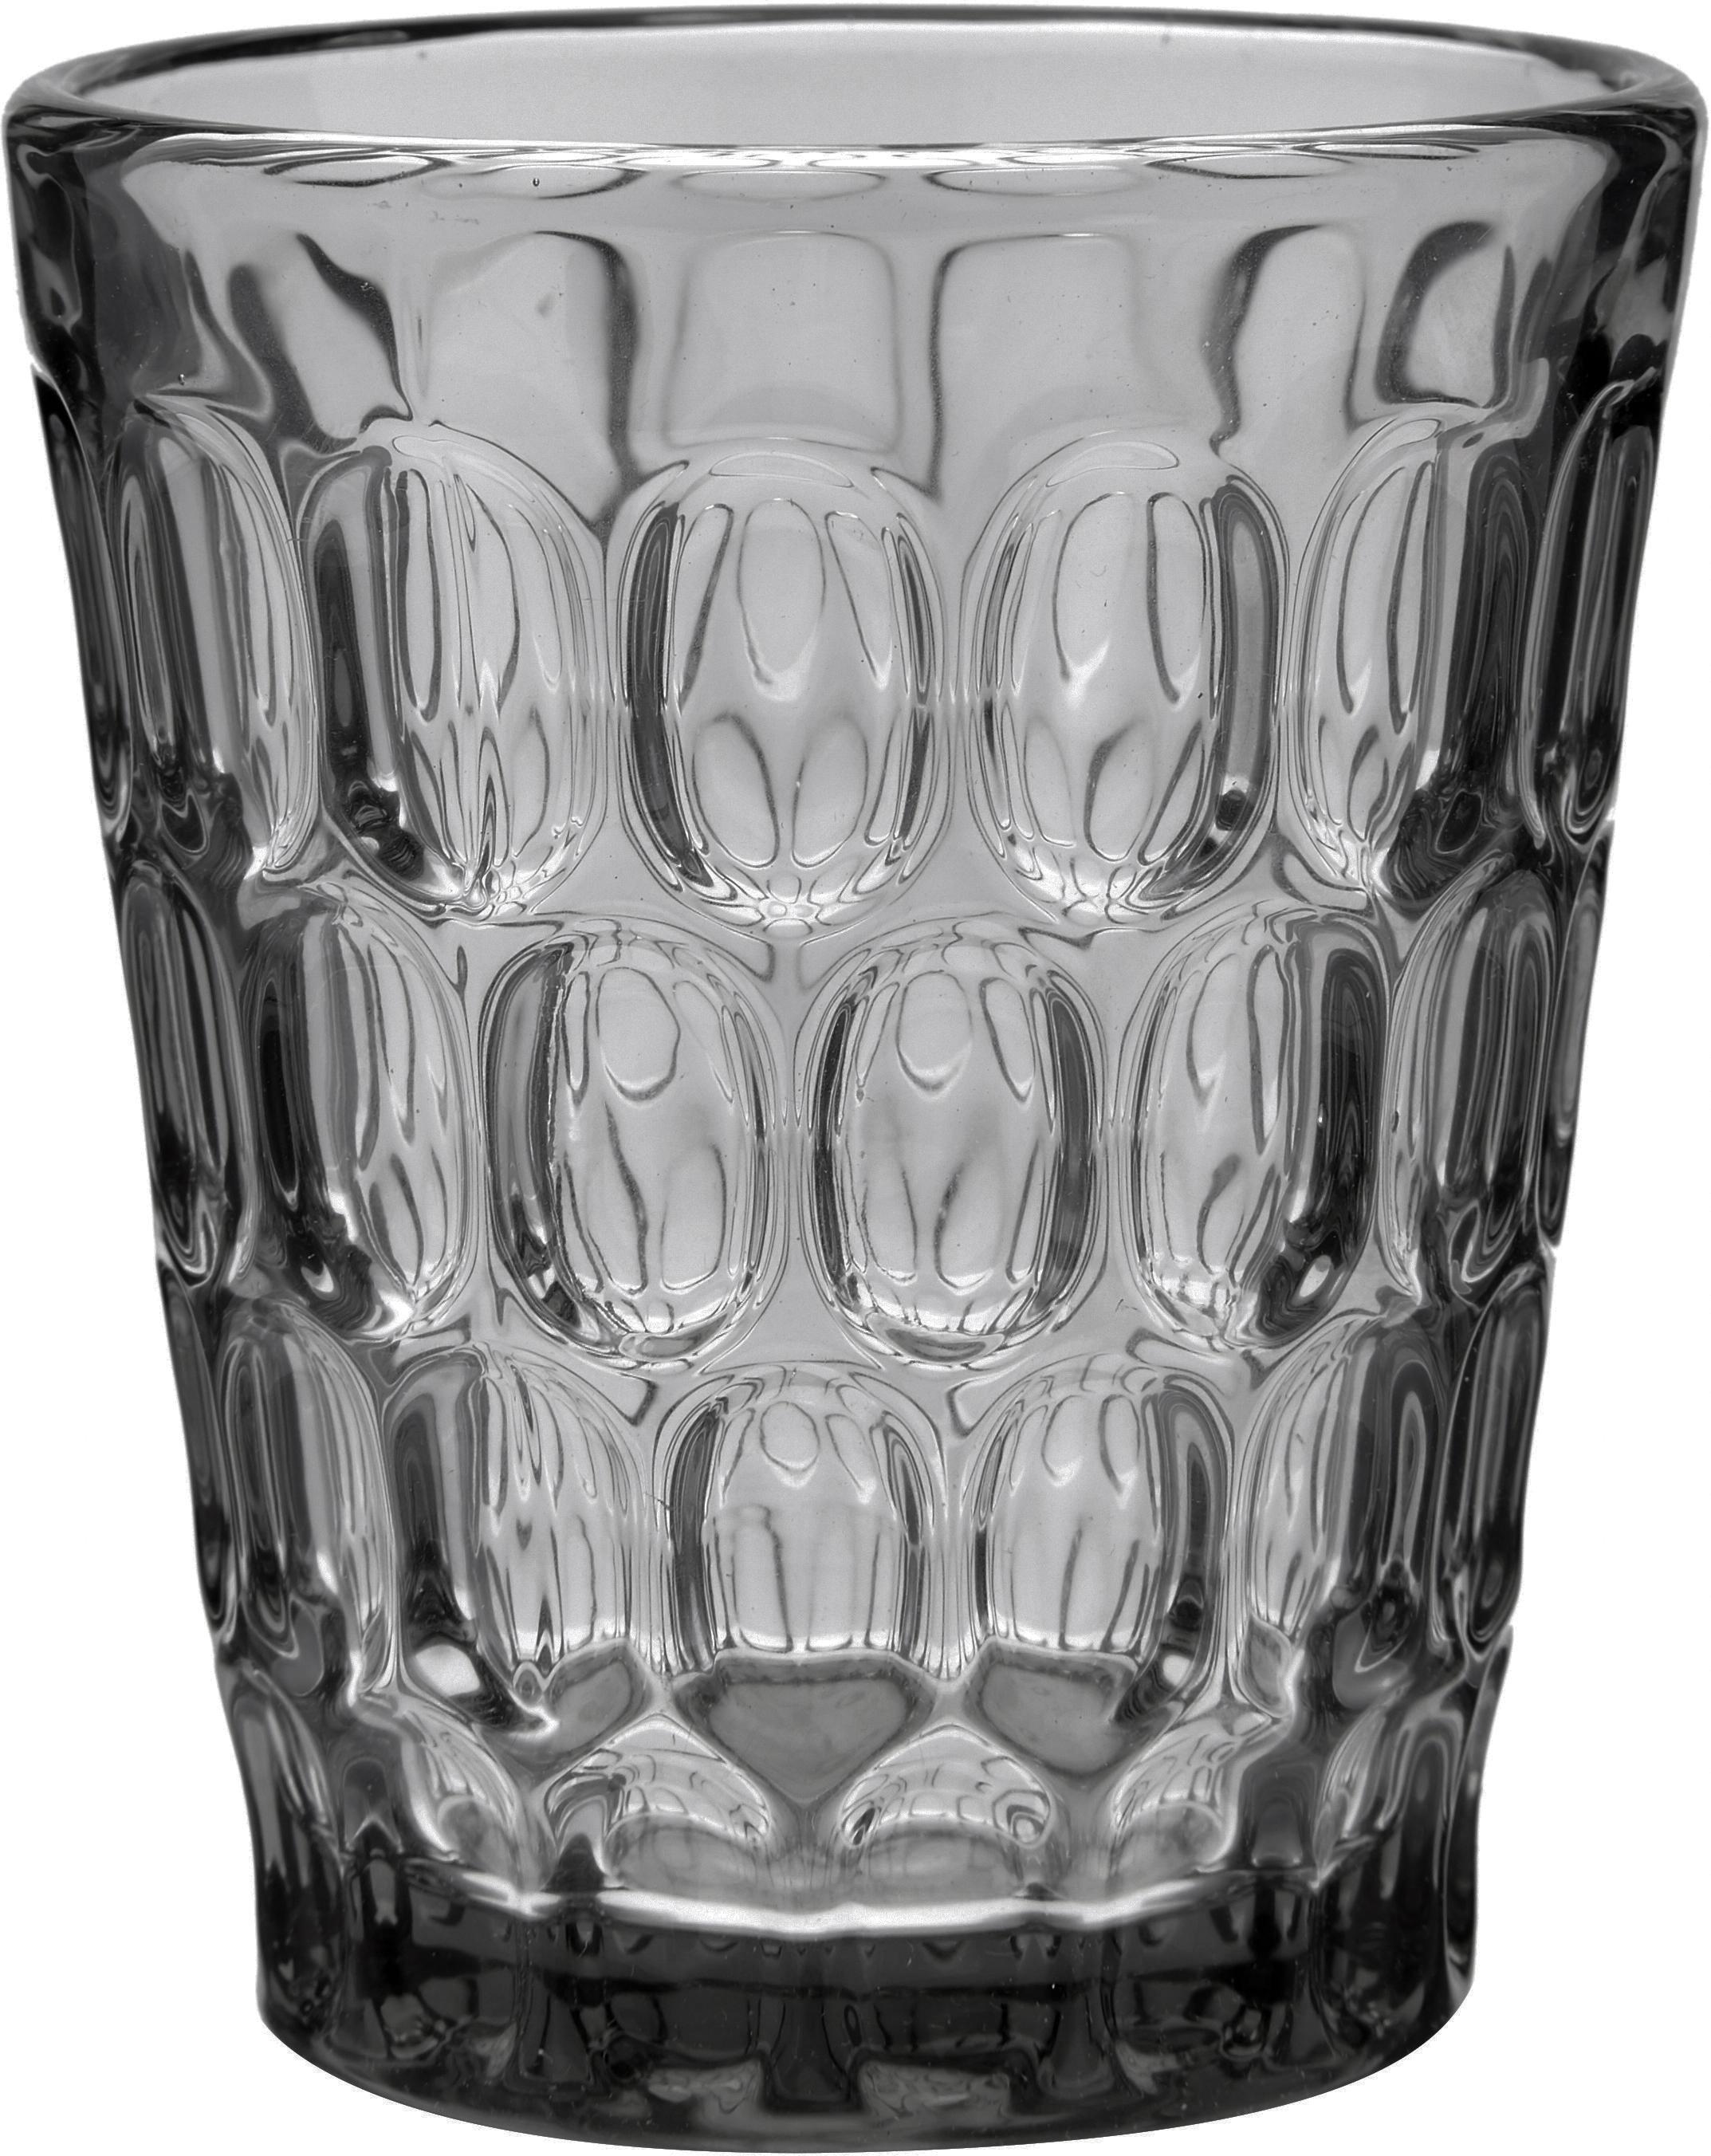 Robuste Wassergläser Optic mit Relief, 6er-Set, Glas, Transparent, Grau, Ø 9 x H 11 cm